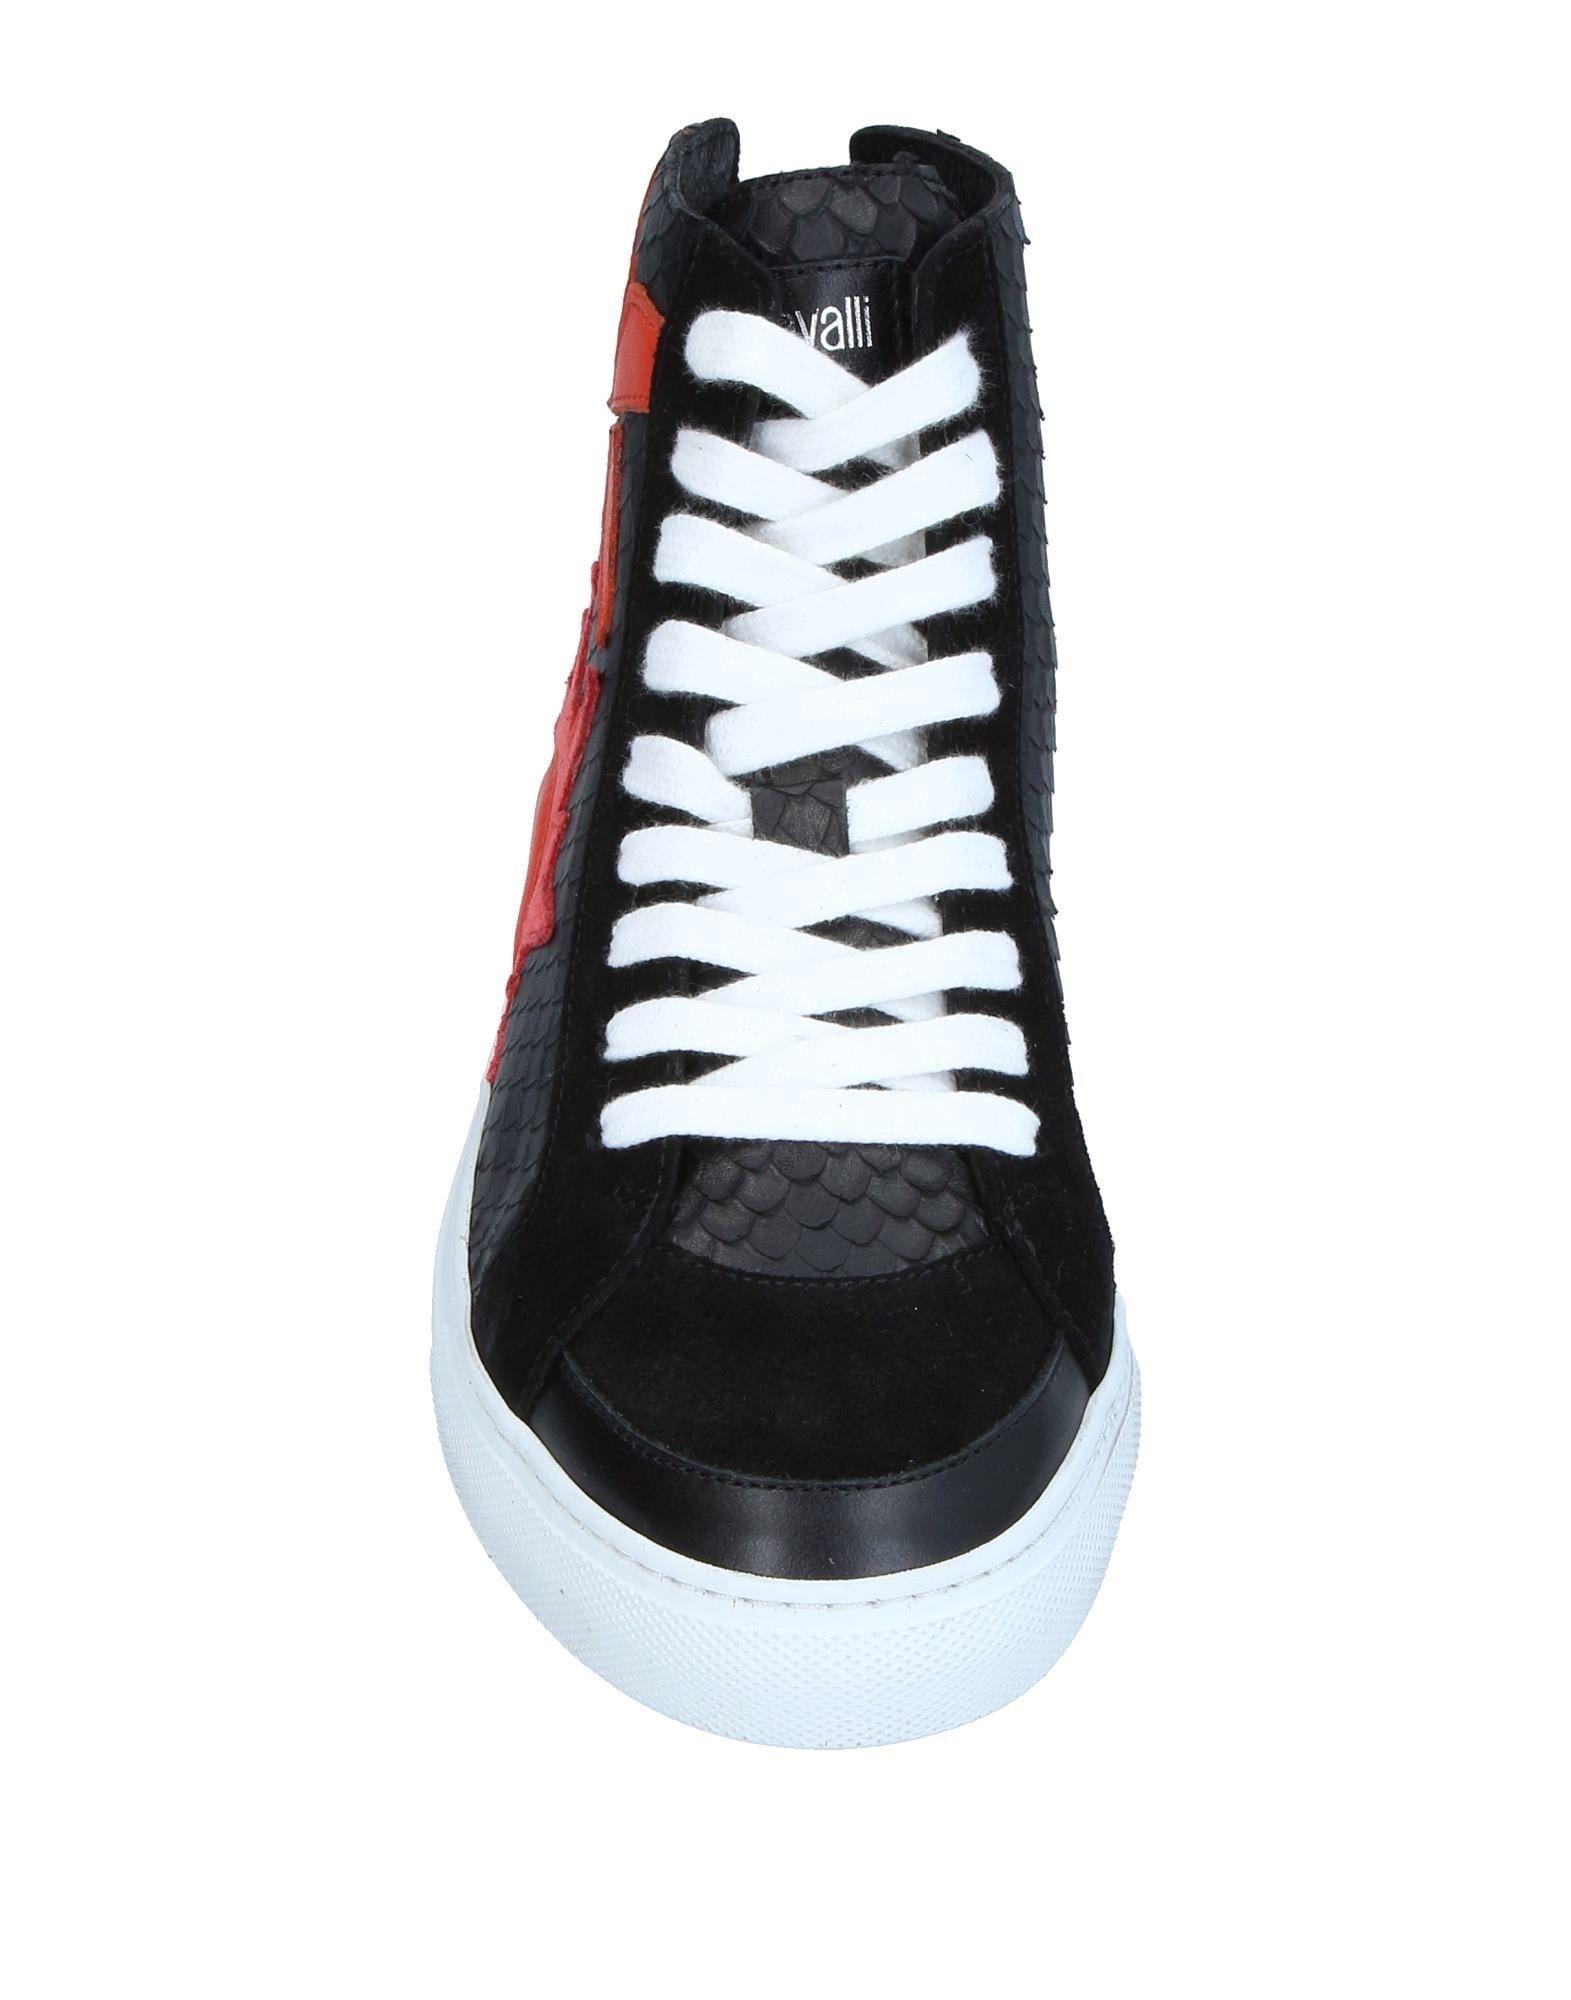 Sneakers Just Cavalli Femme - Sneakers Just Cavalli sur